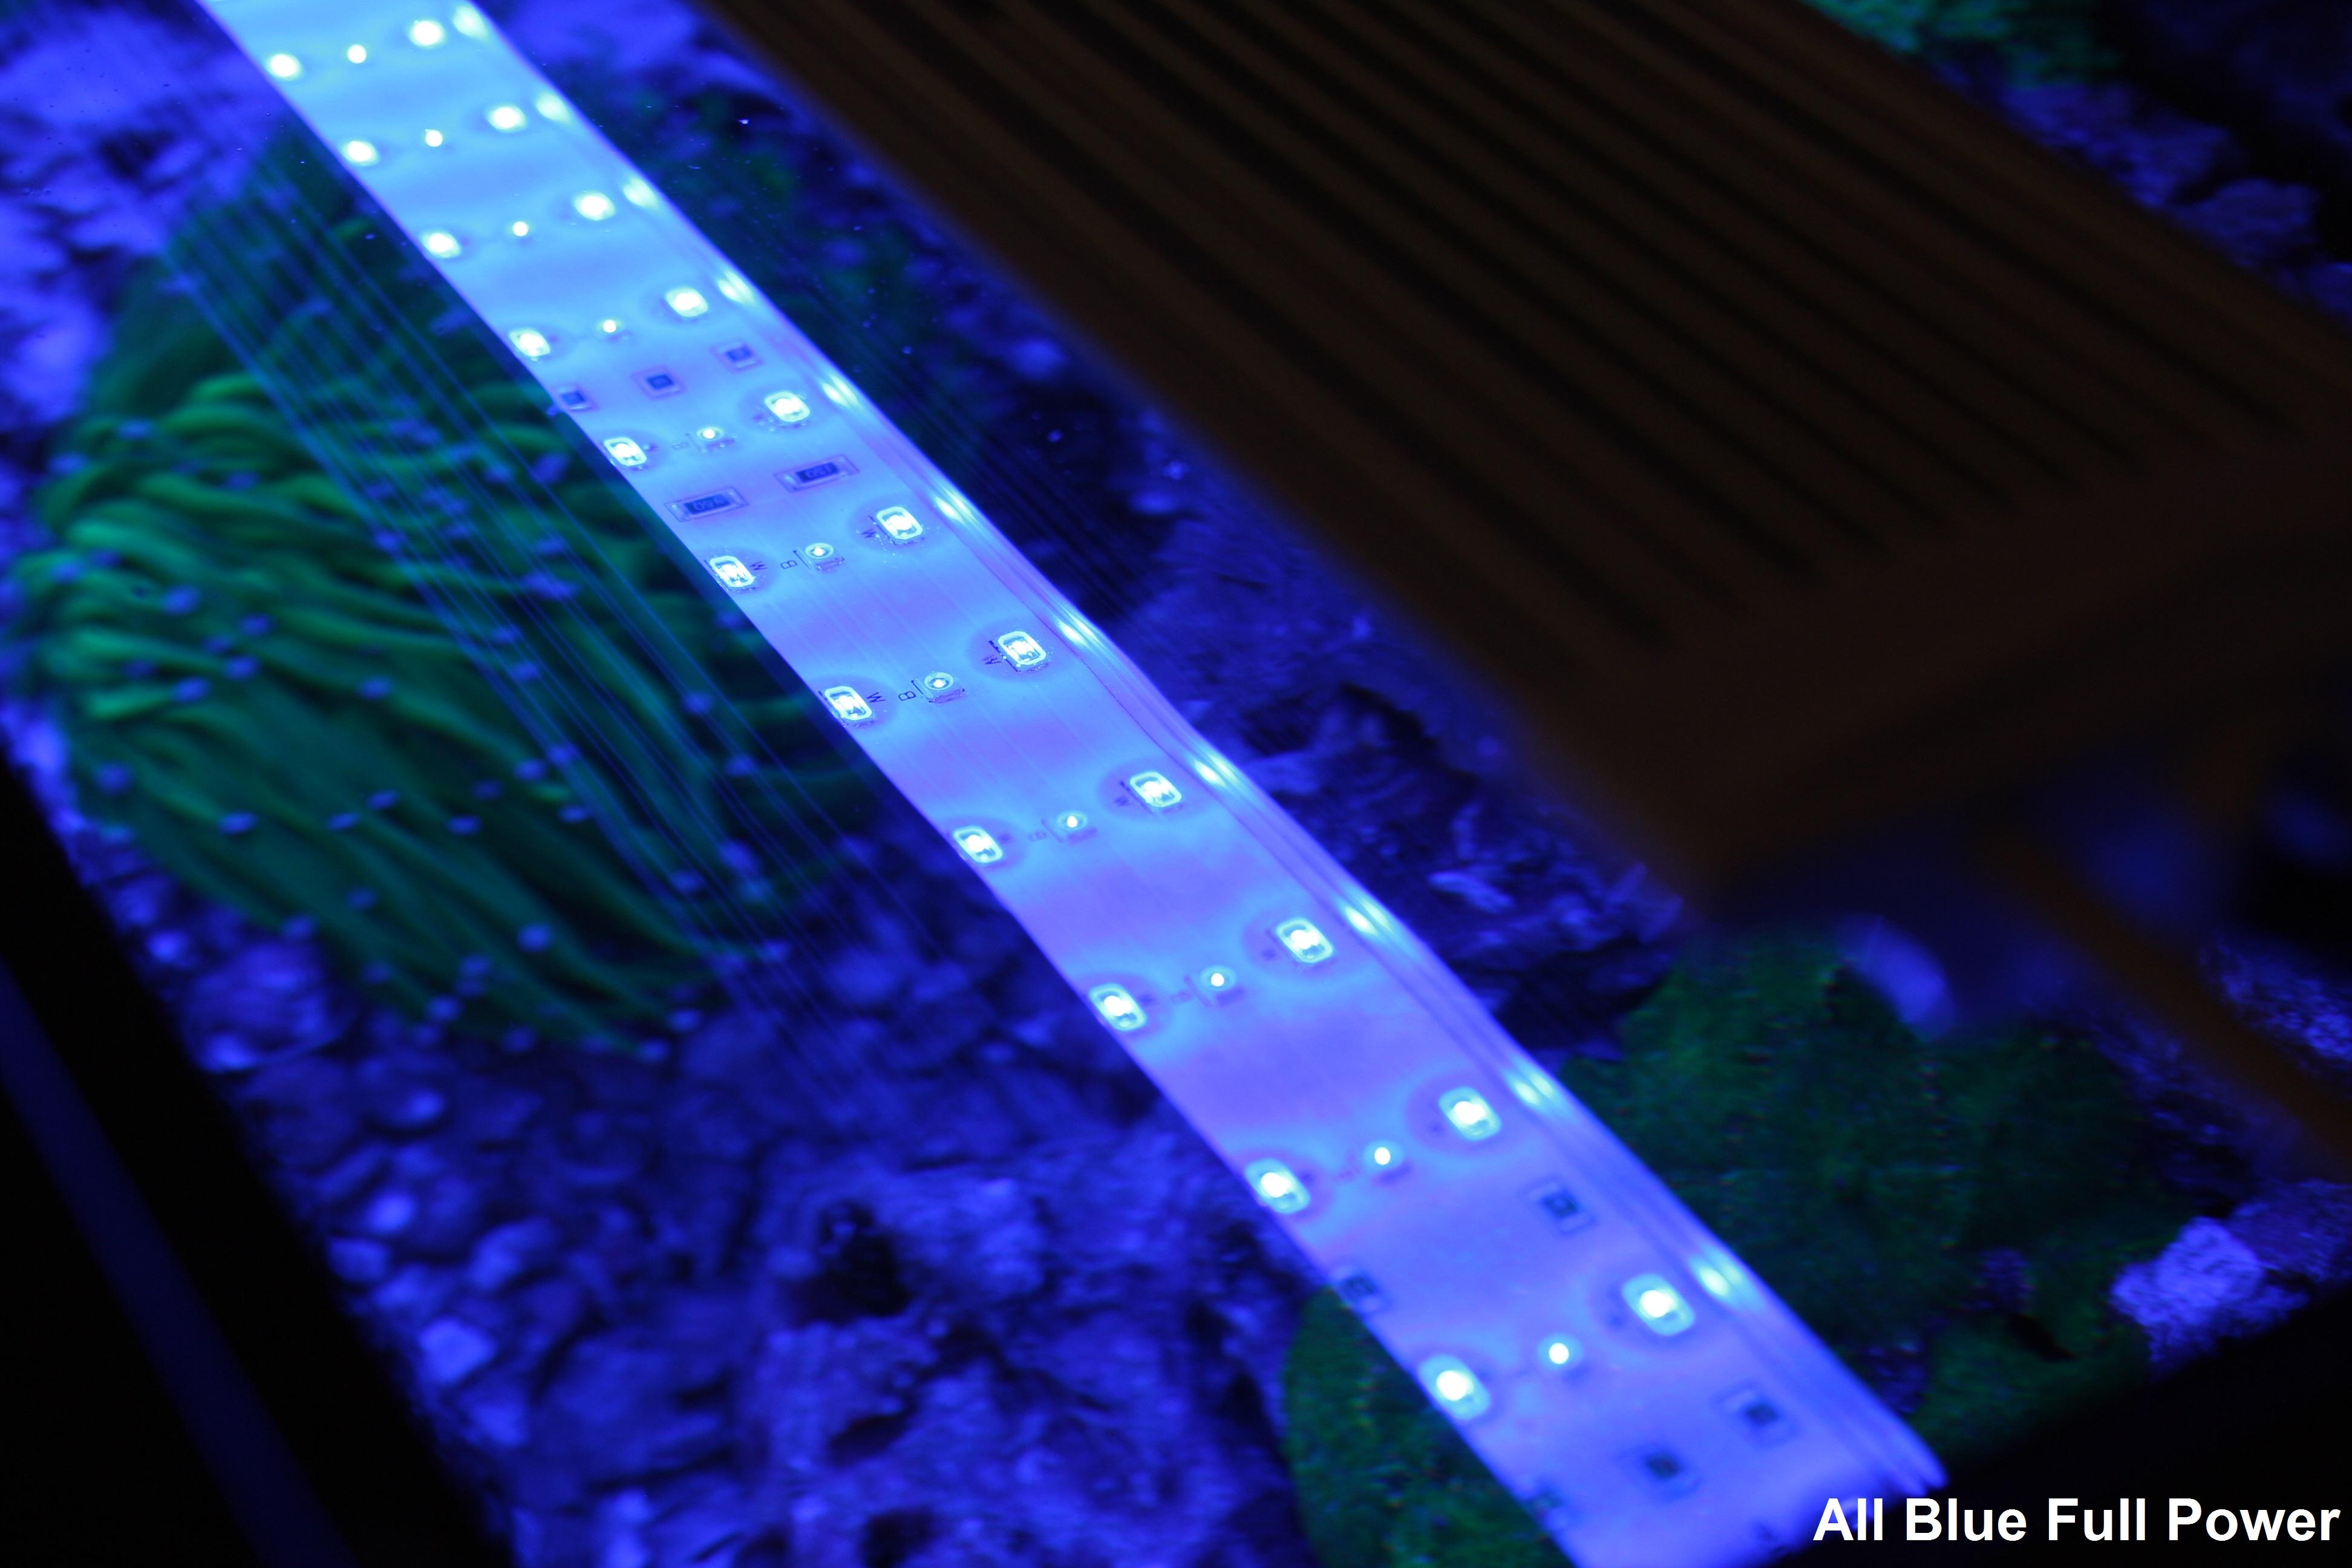 Zetlight Lancia ZP-4000-438 LED Waterproof Aquarium Light, 18-23in All Blue Gallery